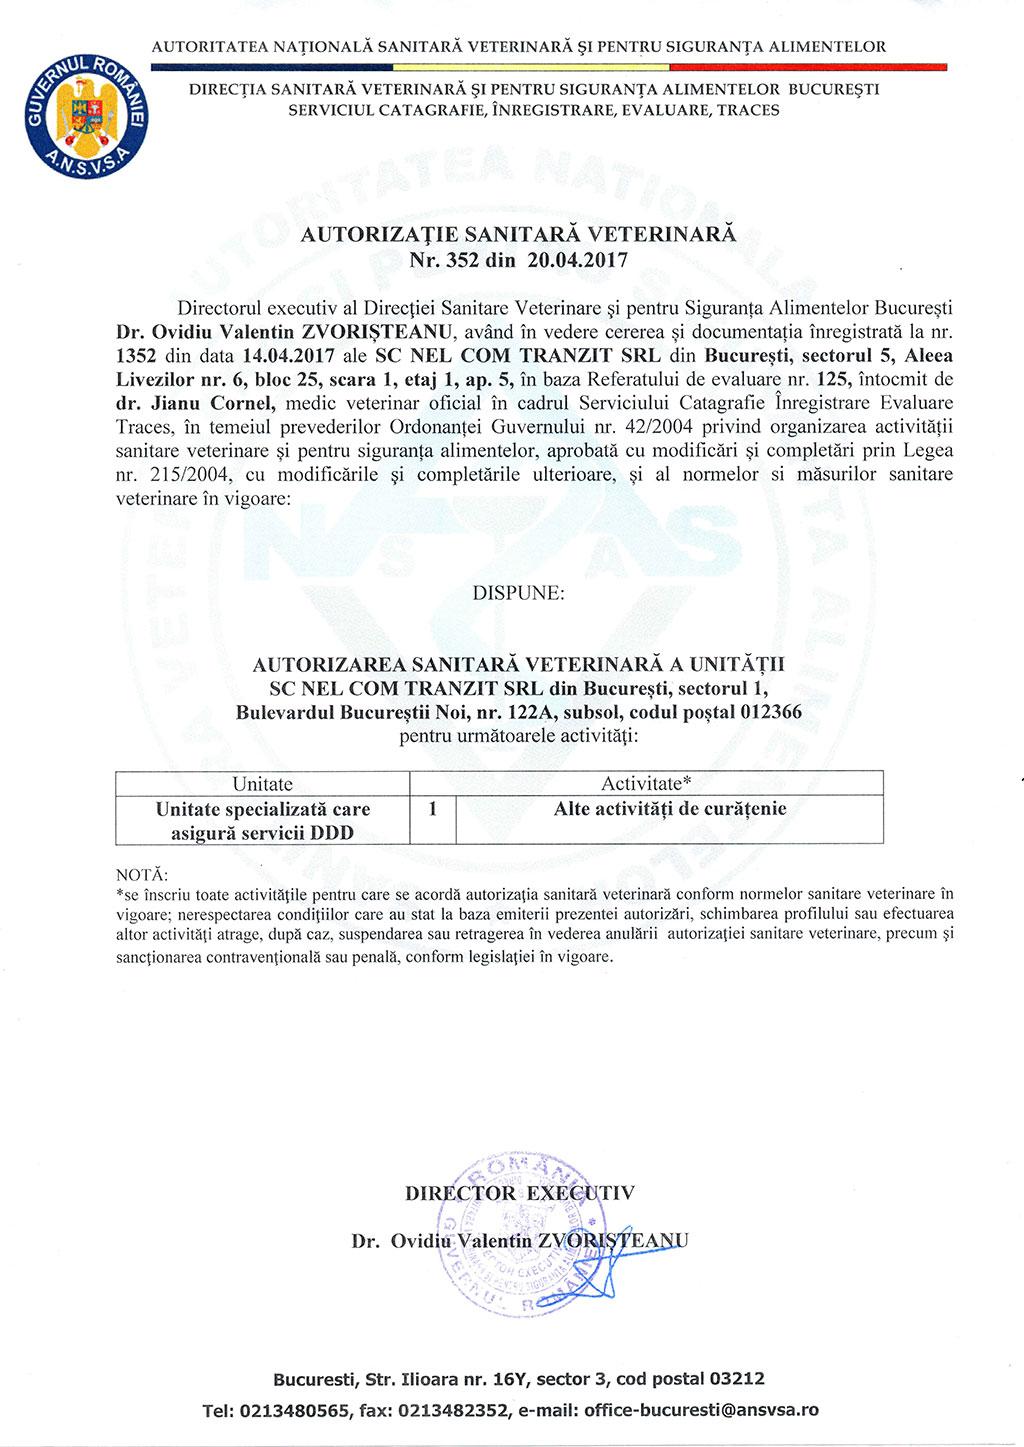 AUTORIZATIE-SANITAR-VETERINARA-NEL-COM